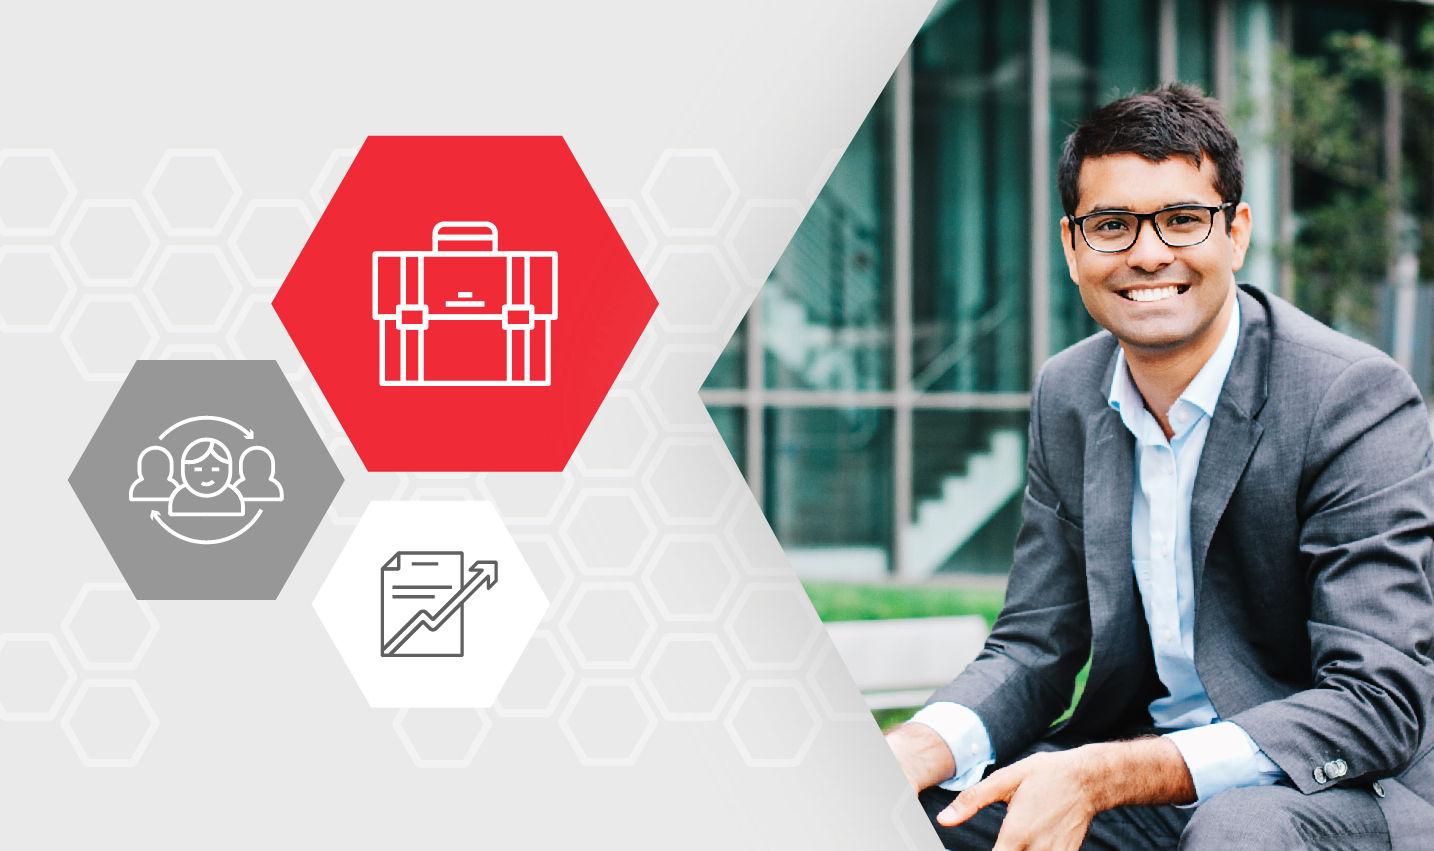 UpGrad Digital Marketing Program Review- Entrepreneurship Certificate Program